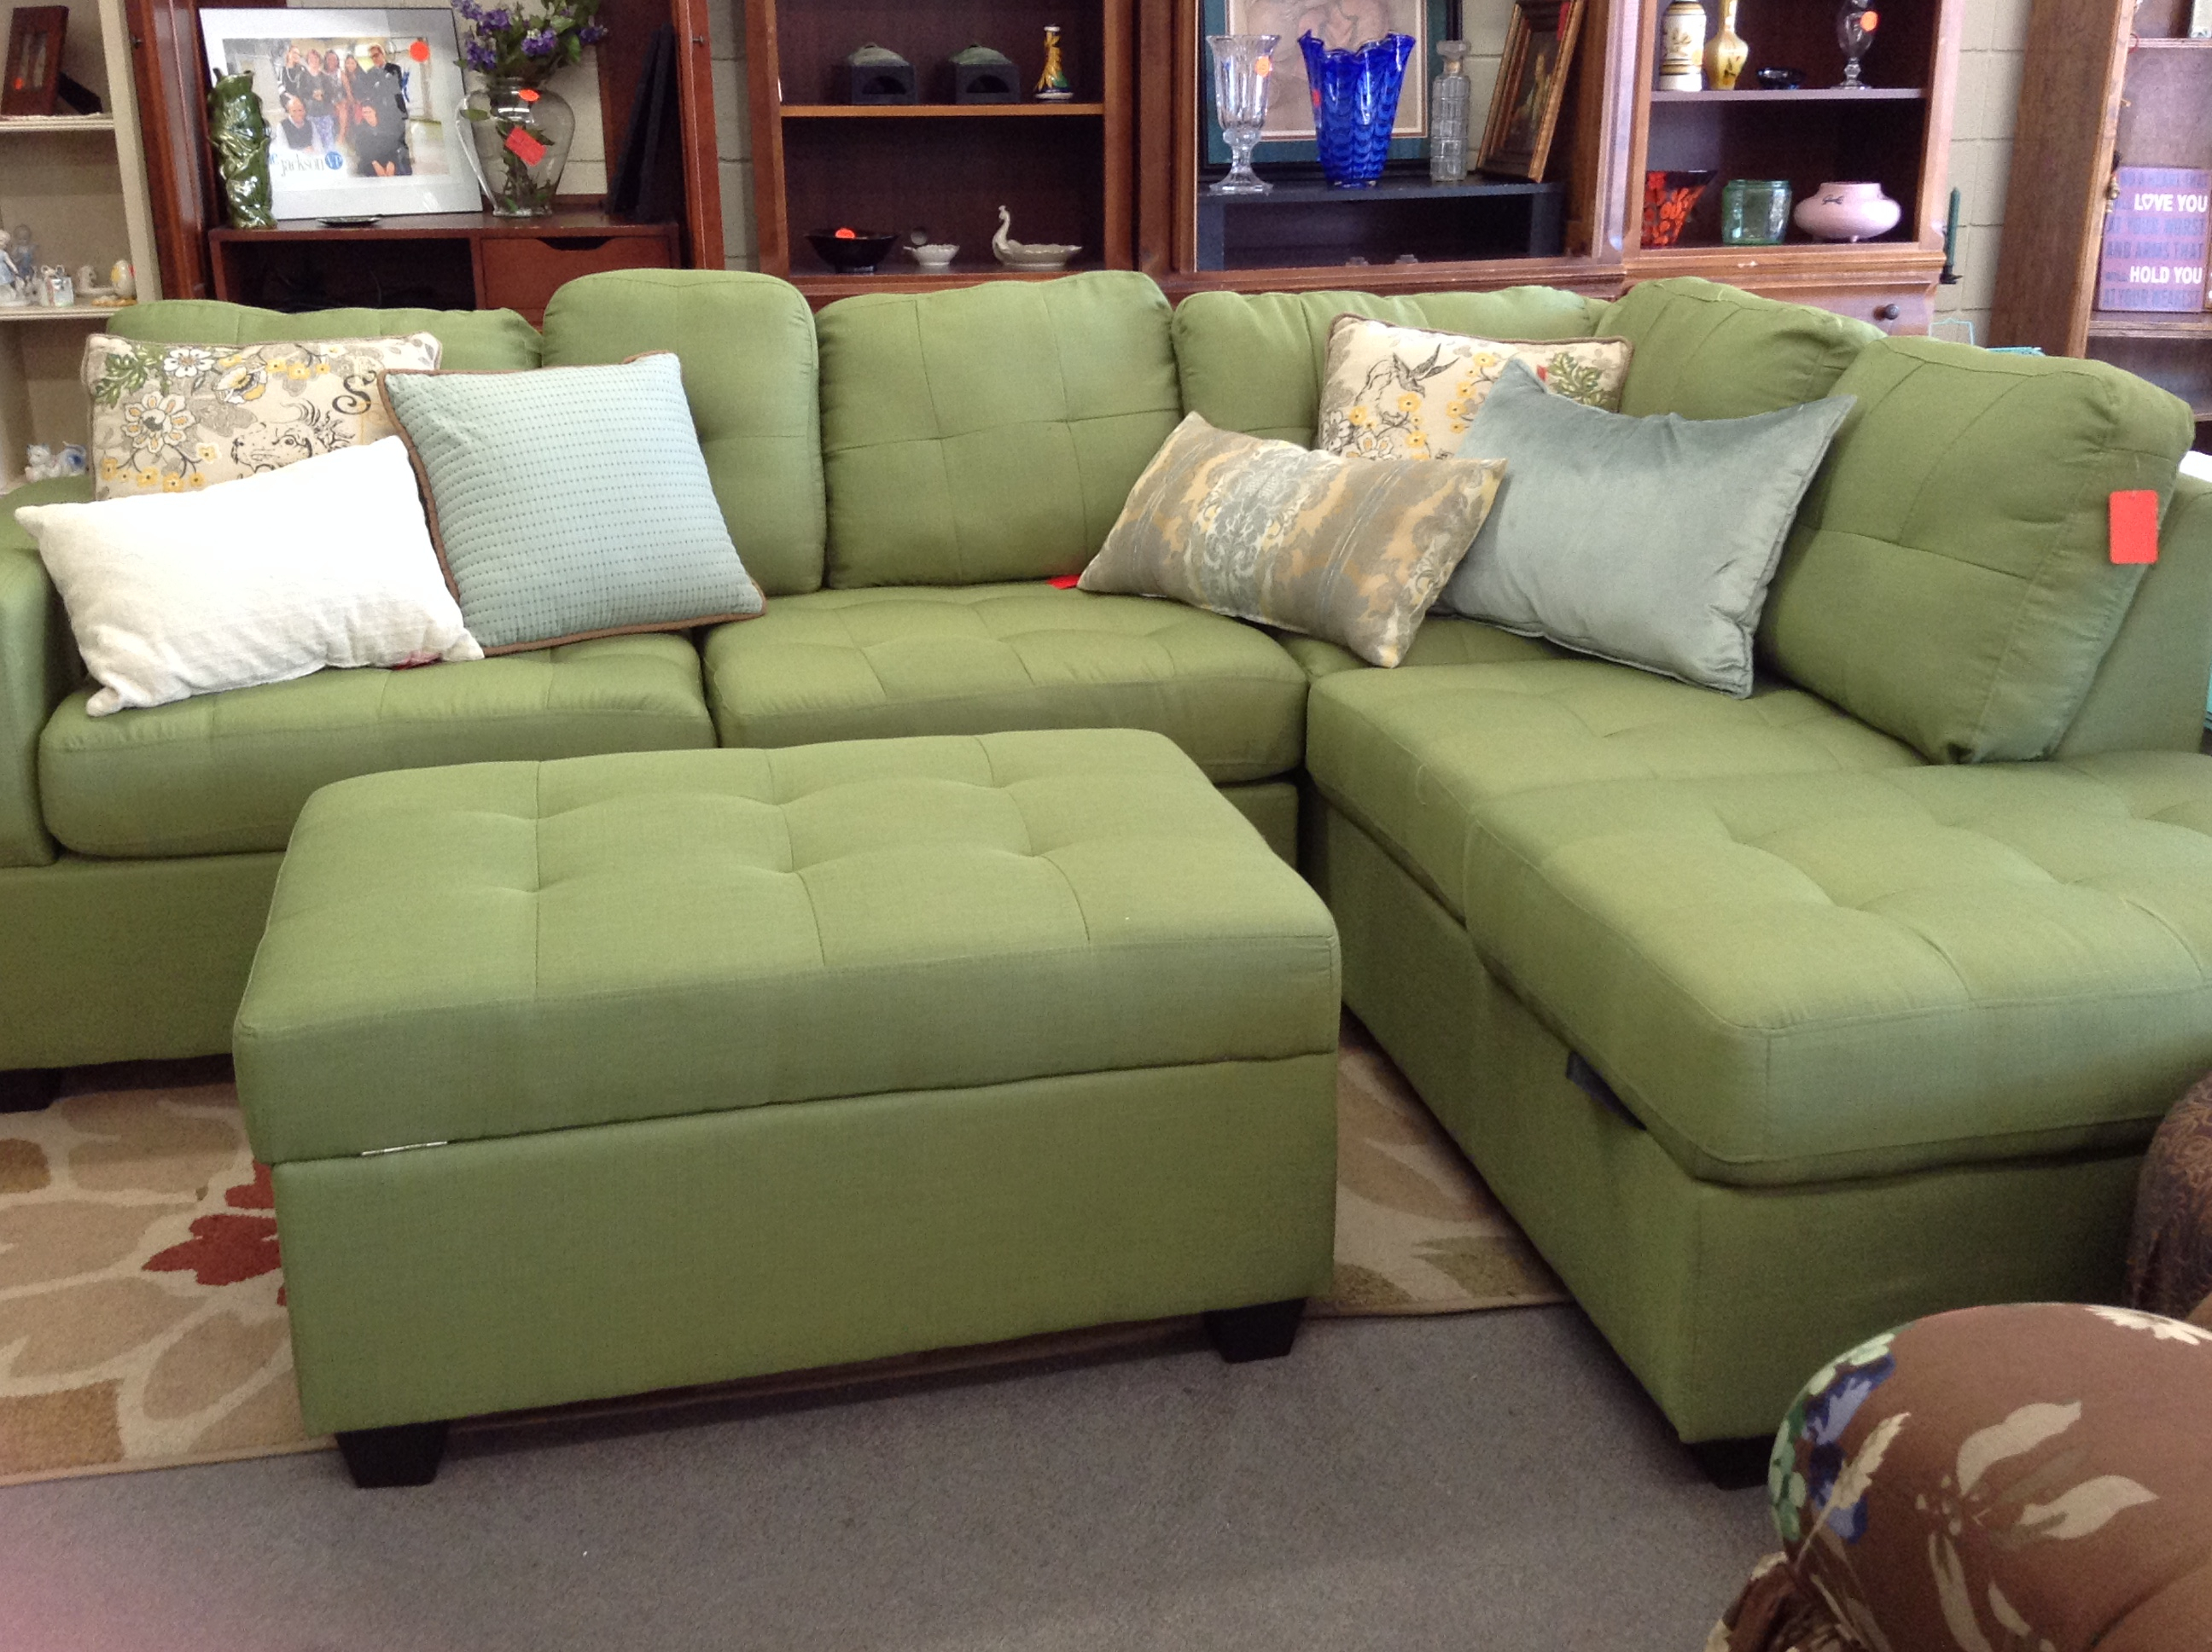 Gallery | Escondido, Ca With Regard To Escondido Sofa Chairs (Image 9 of 20)